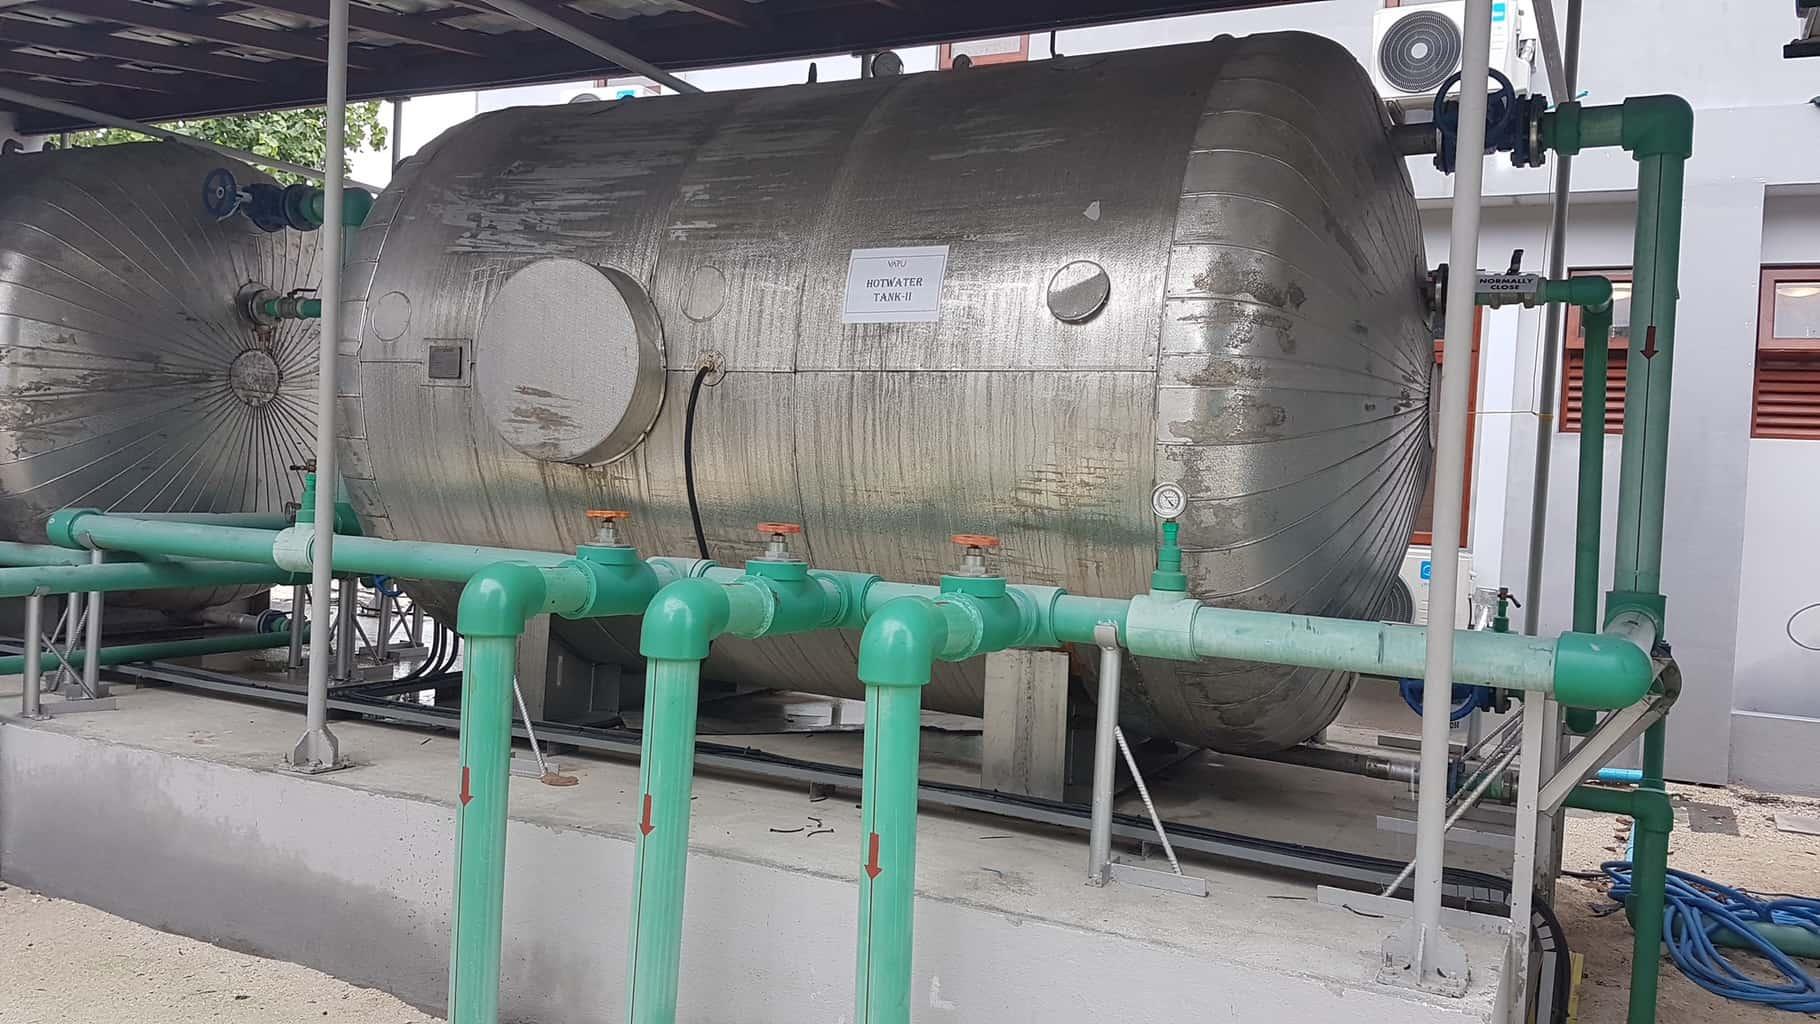 https://replan.com.sg/wp-content/uploads/2020/08/Roediger-Vacuum-Sewer-Tank.jpeg